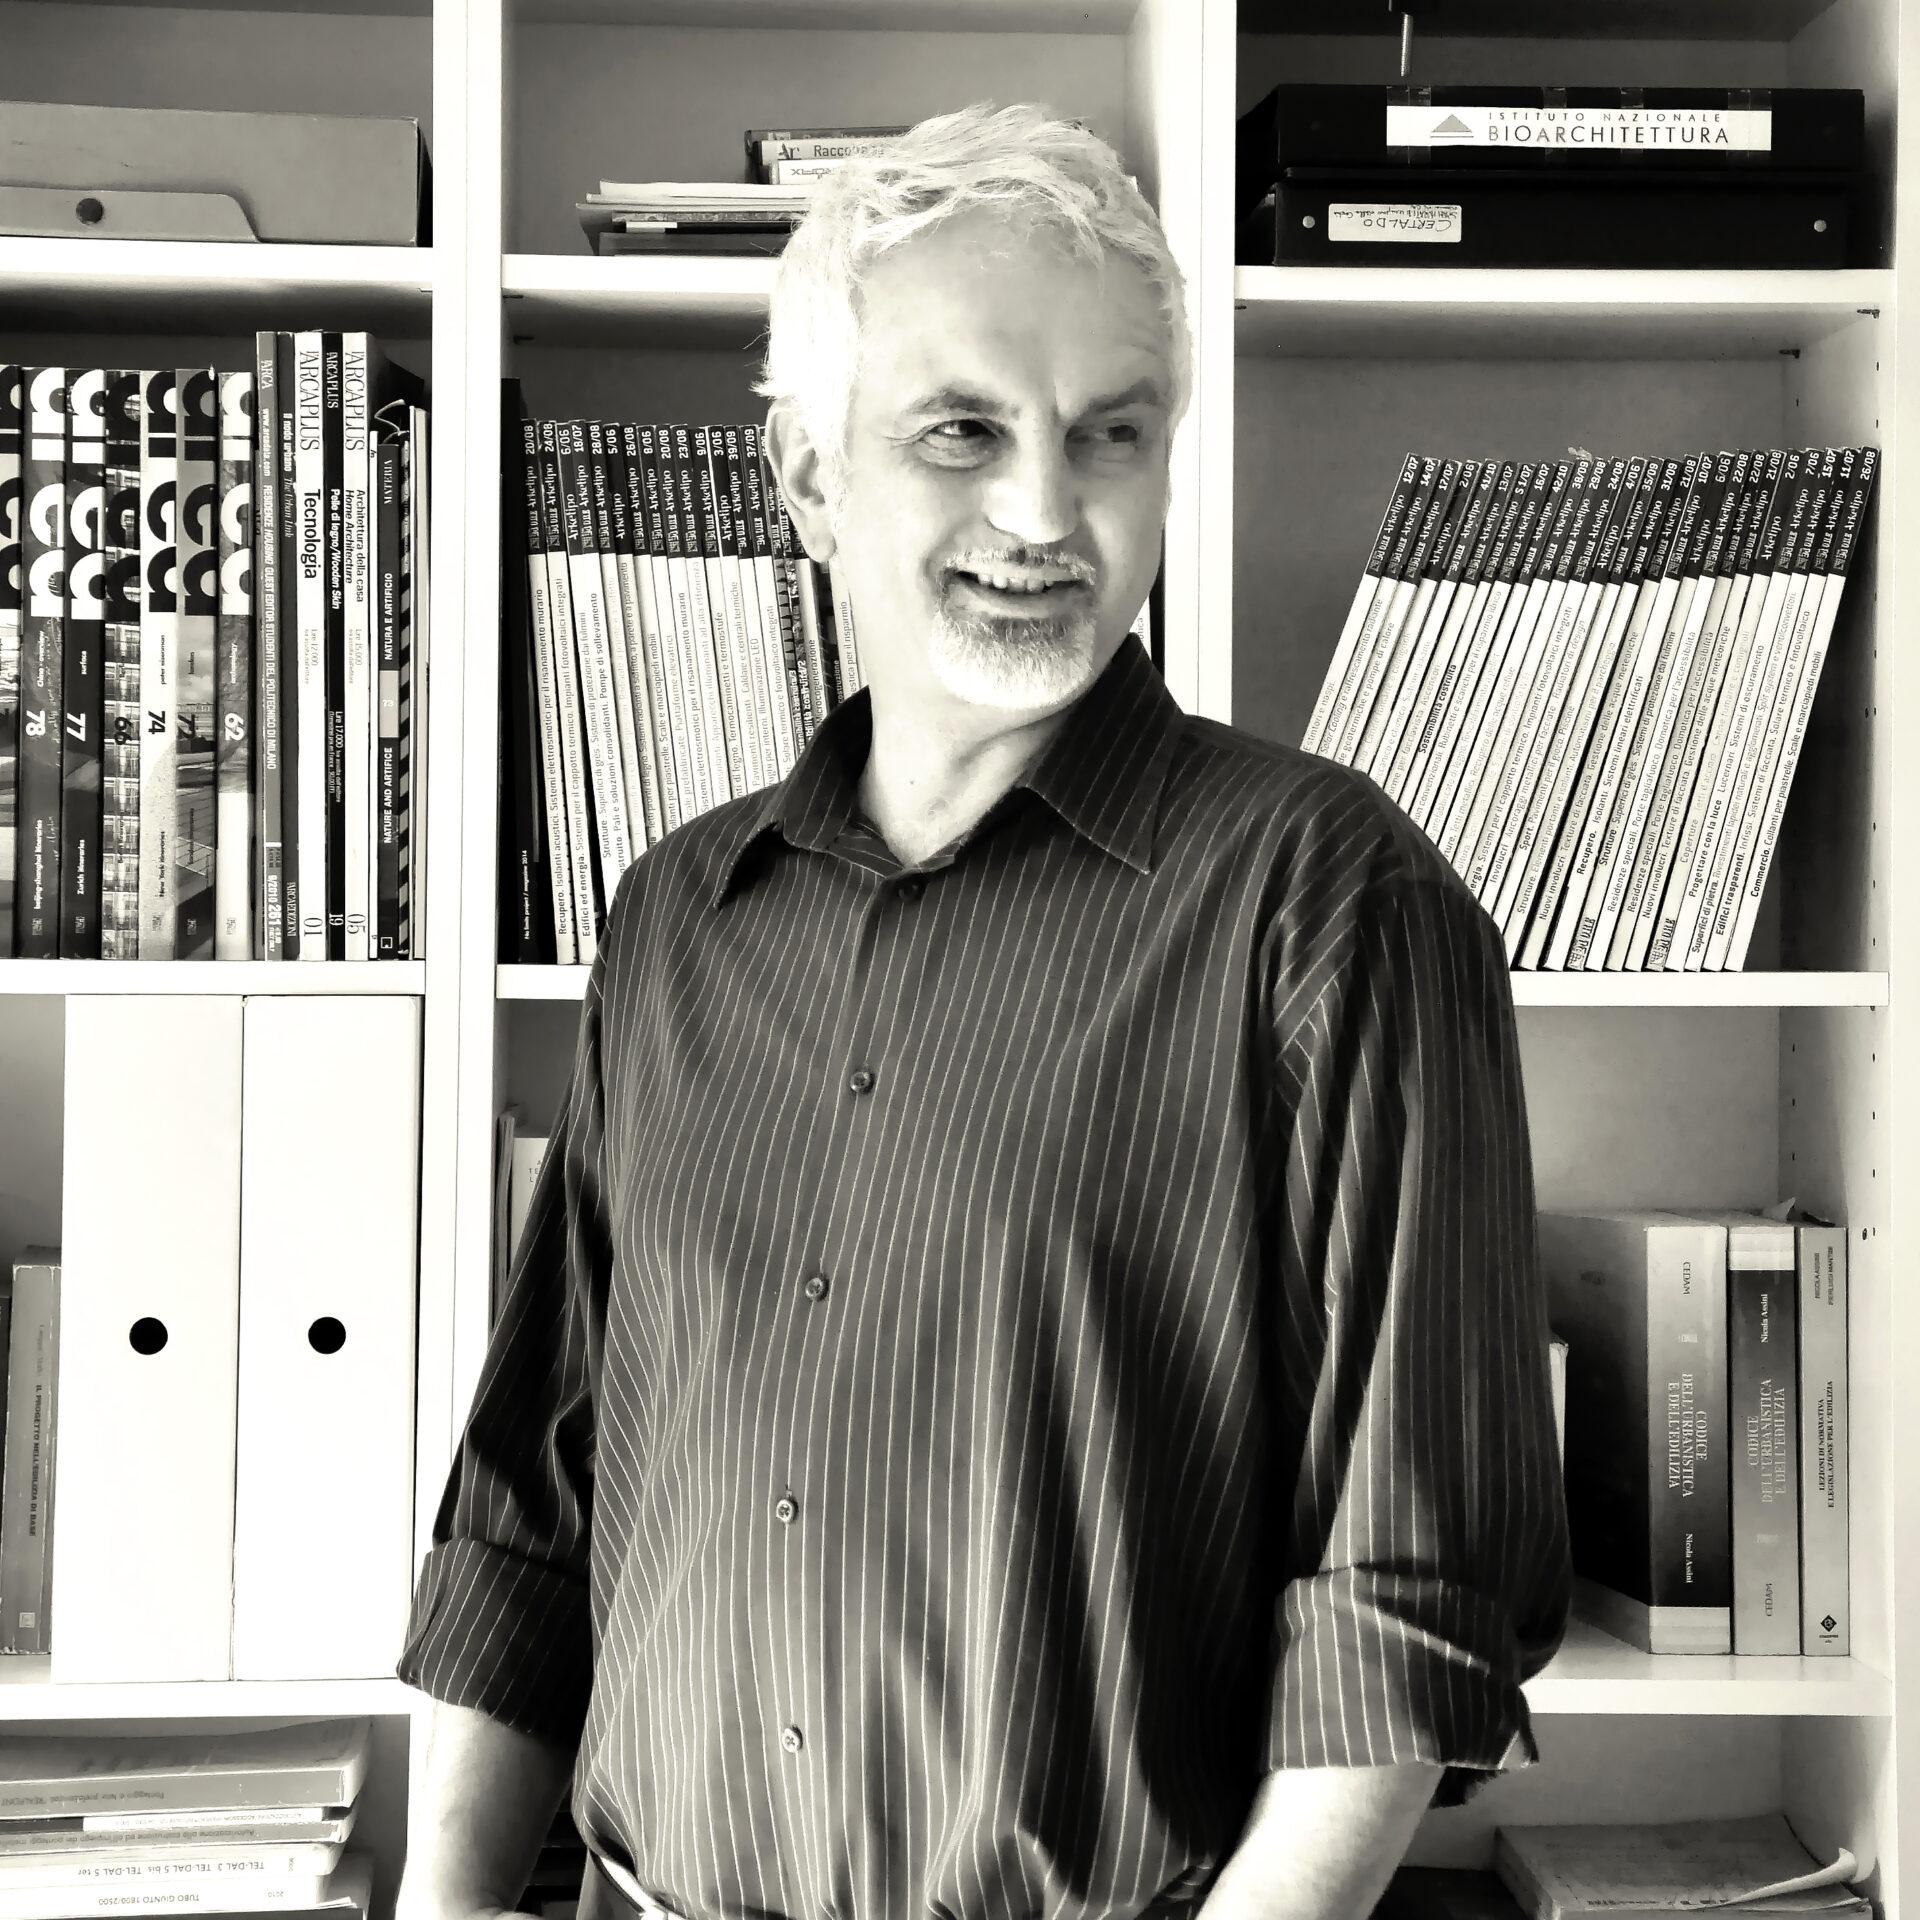 Nicola Chirdo